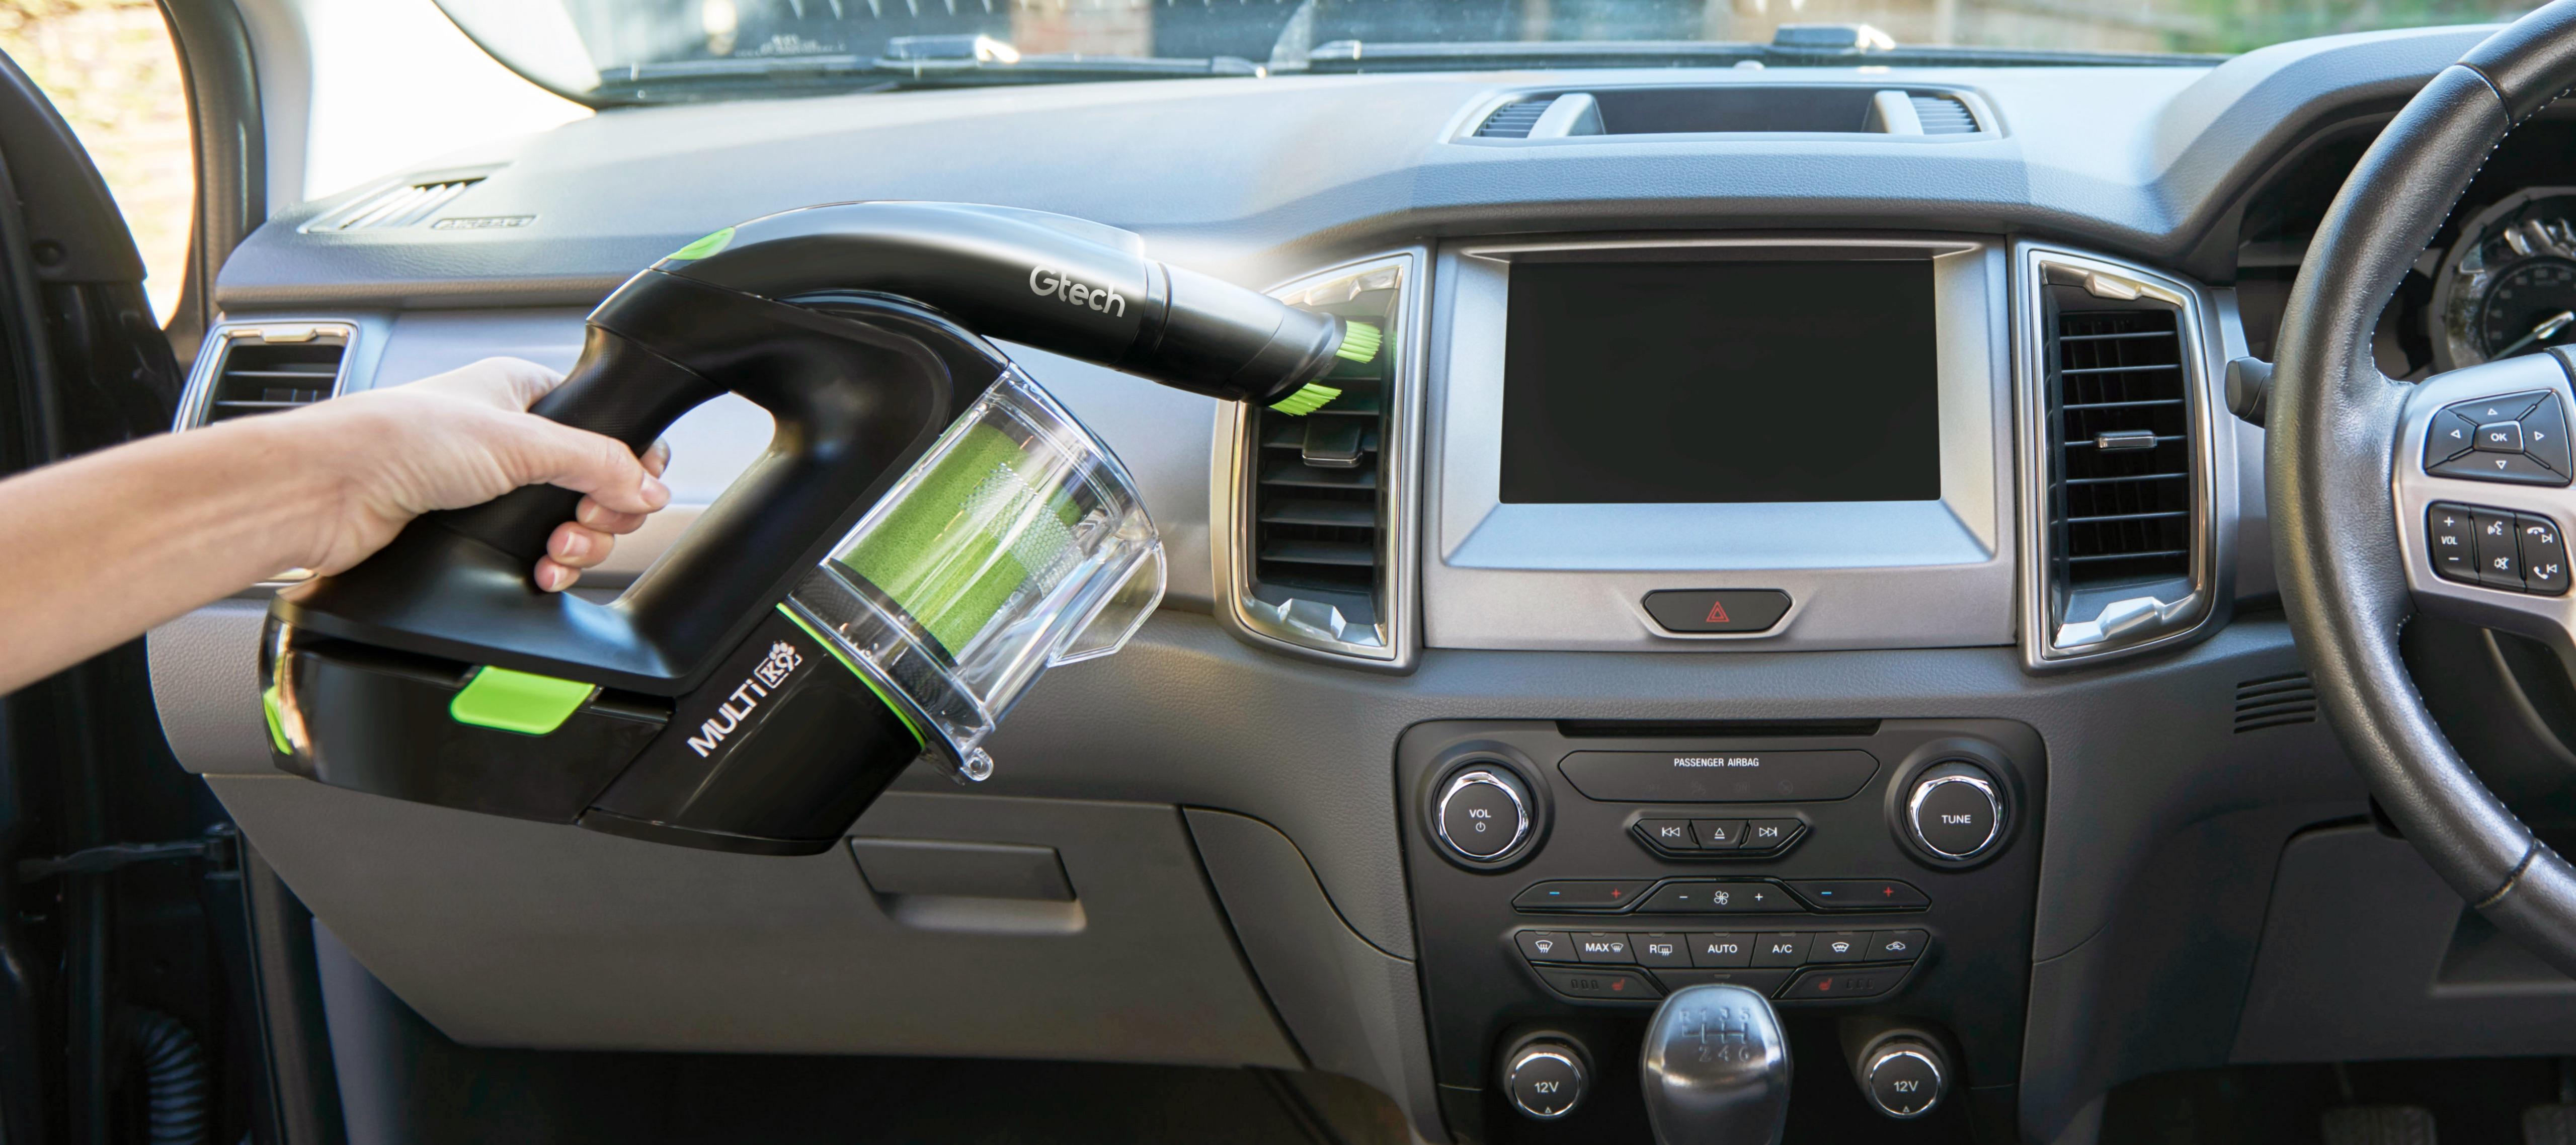 Multi K9 handheld car vacuum cleaner